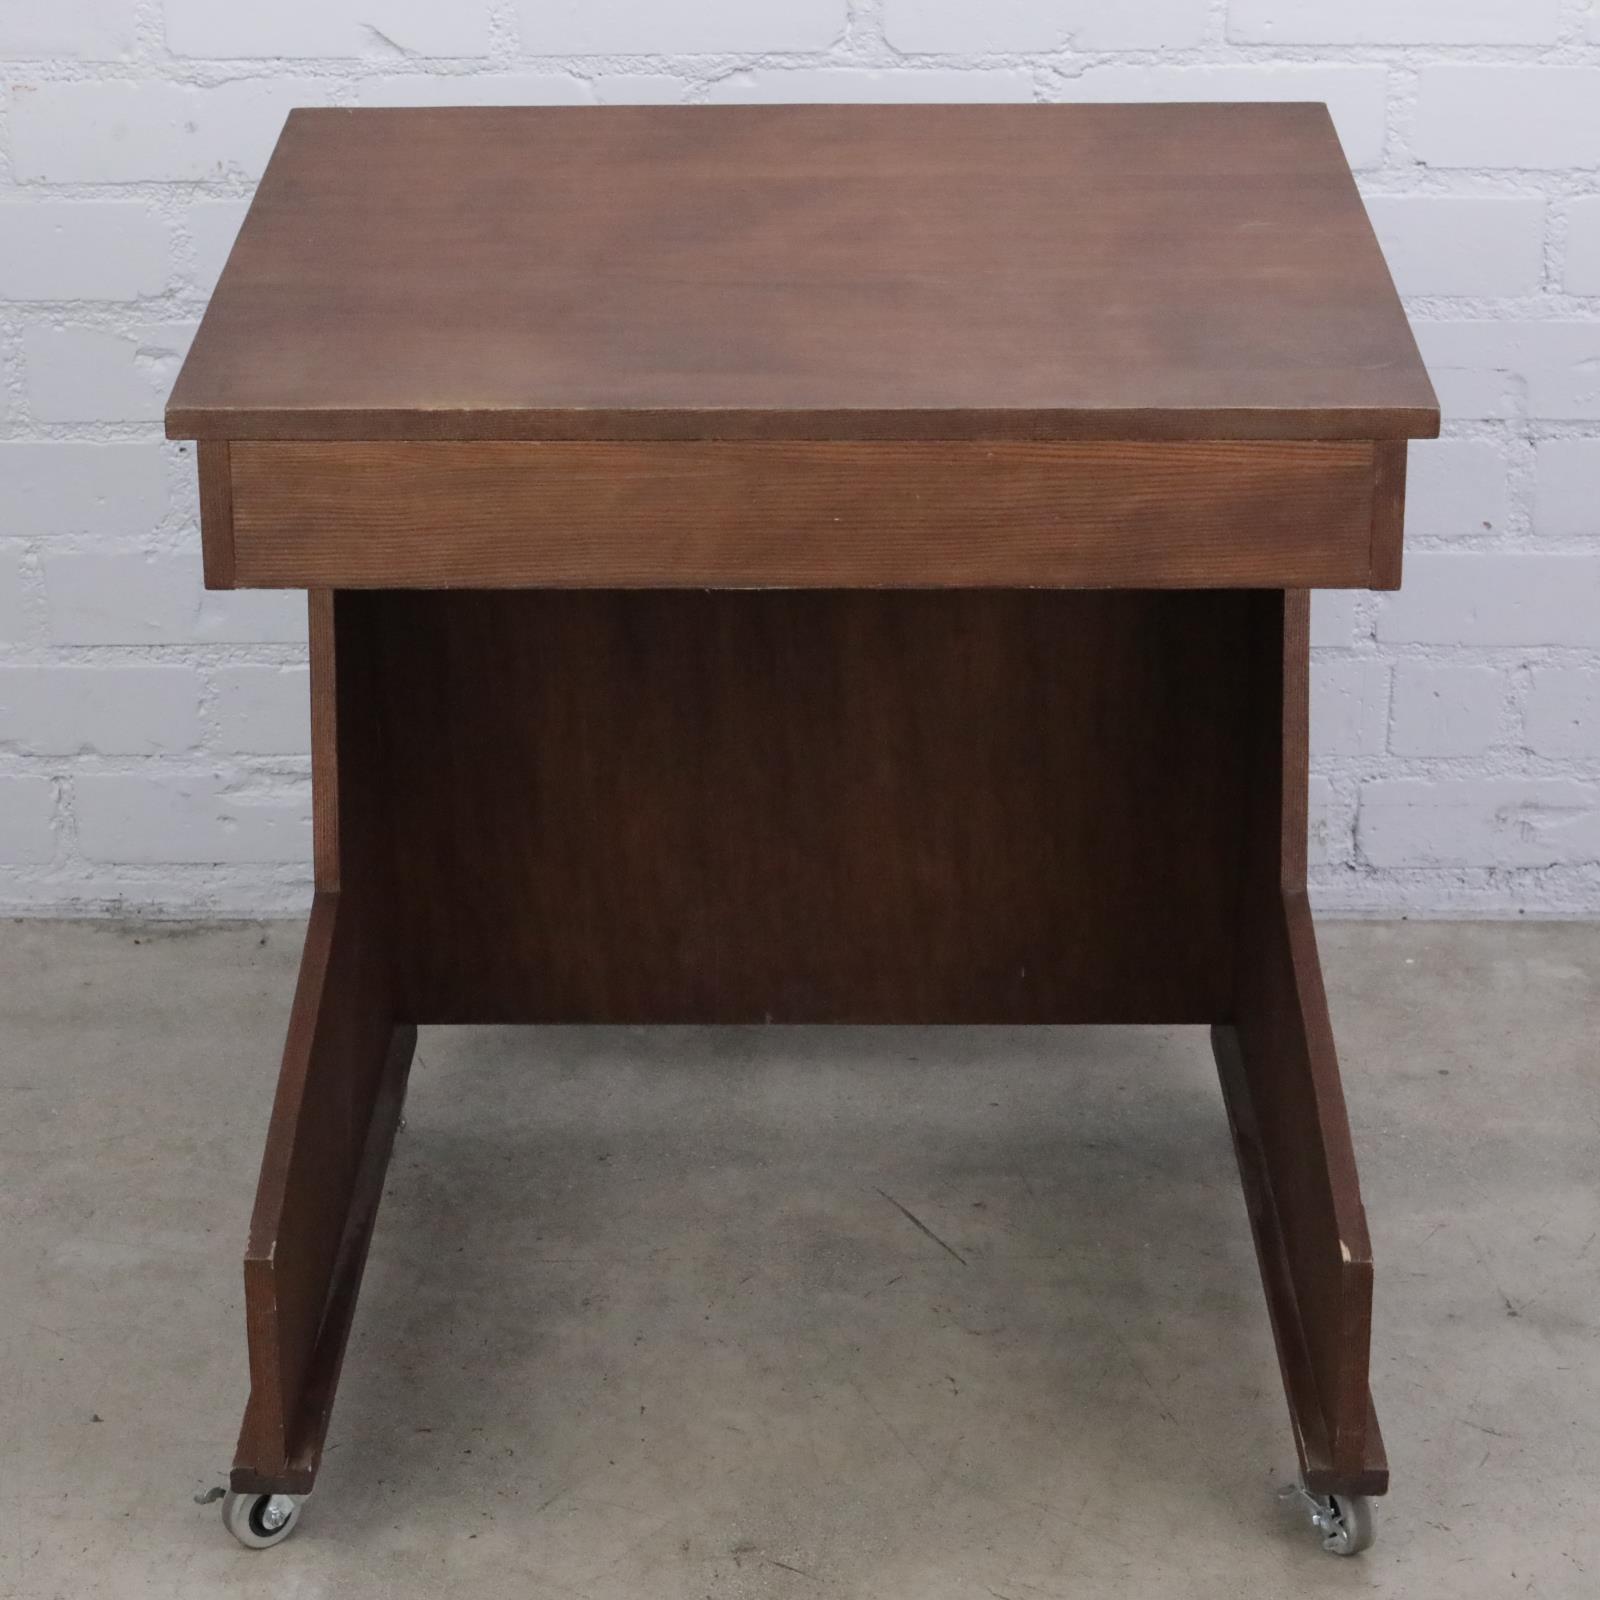 Custom Wood Studio Pro Tools Workstation Mobile Desk w/ Casters #42477